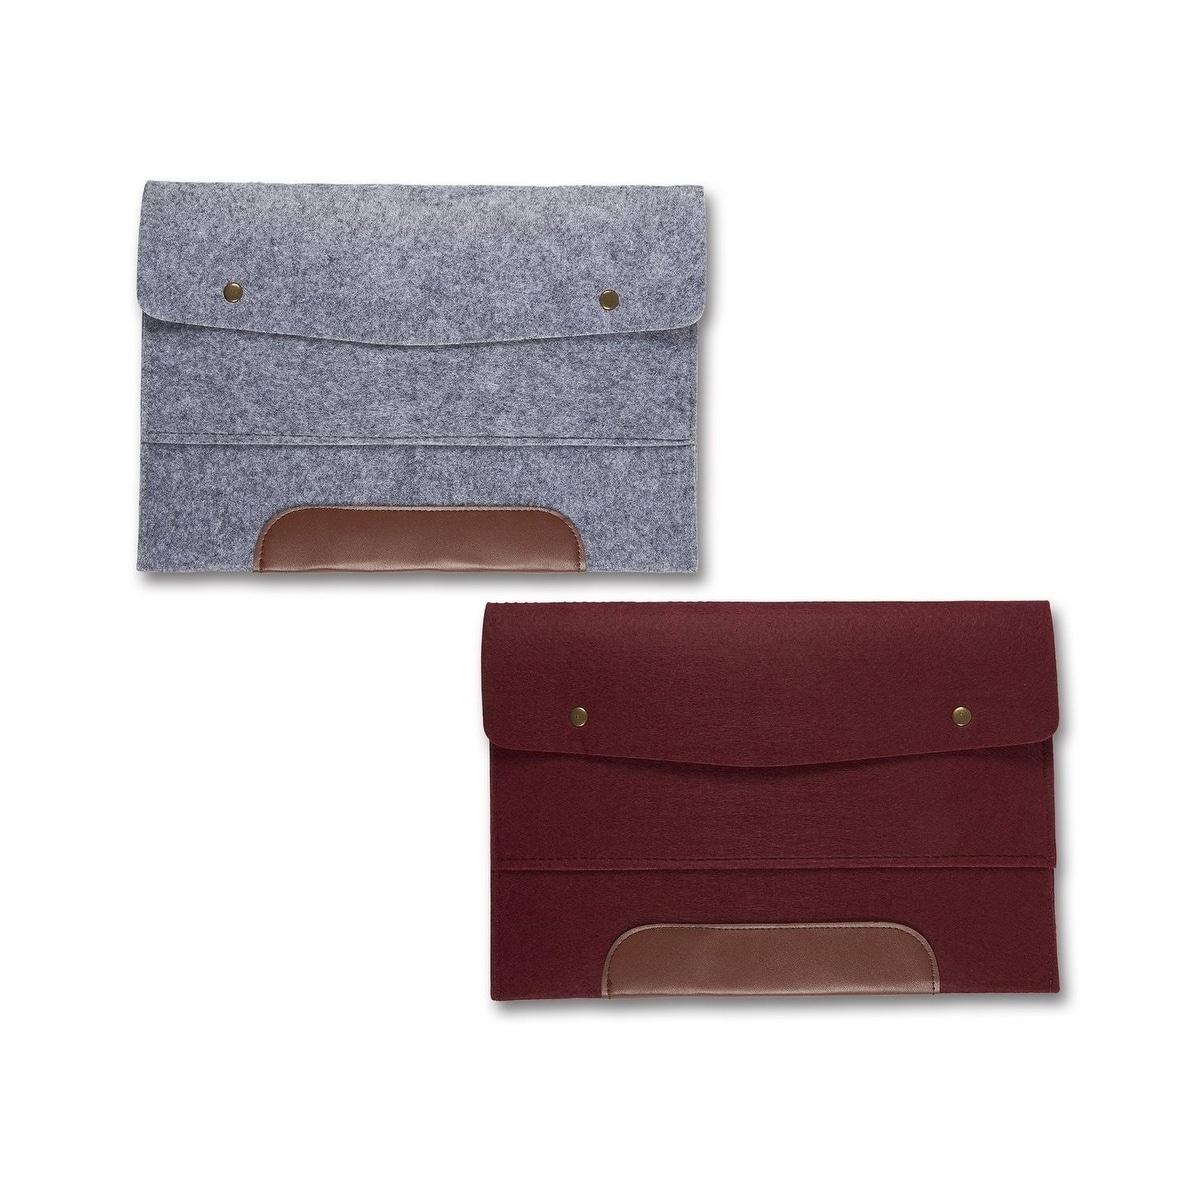 protective cover Office folder felt envelope Notebook A4 made of felt with block writing pad Filzmappe